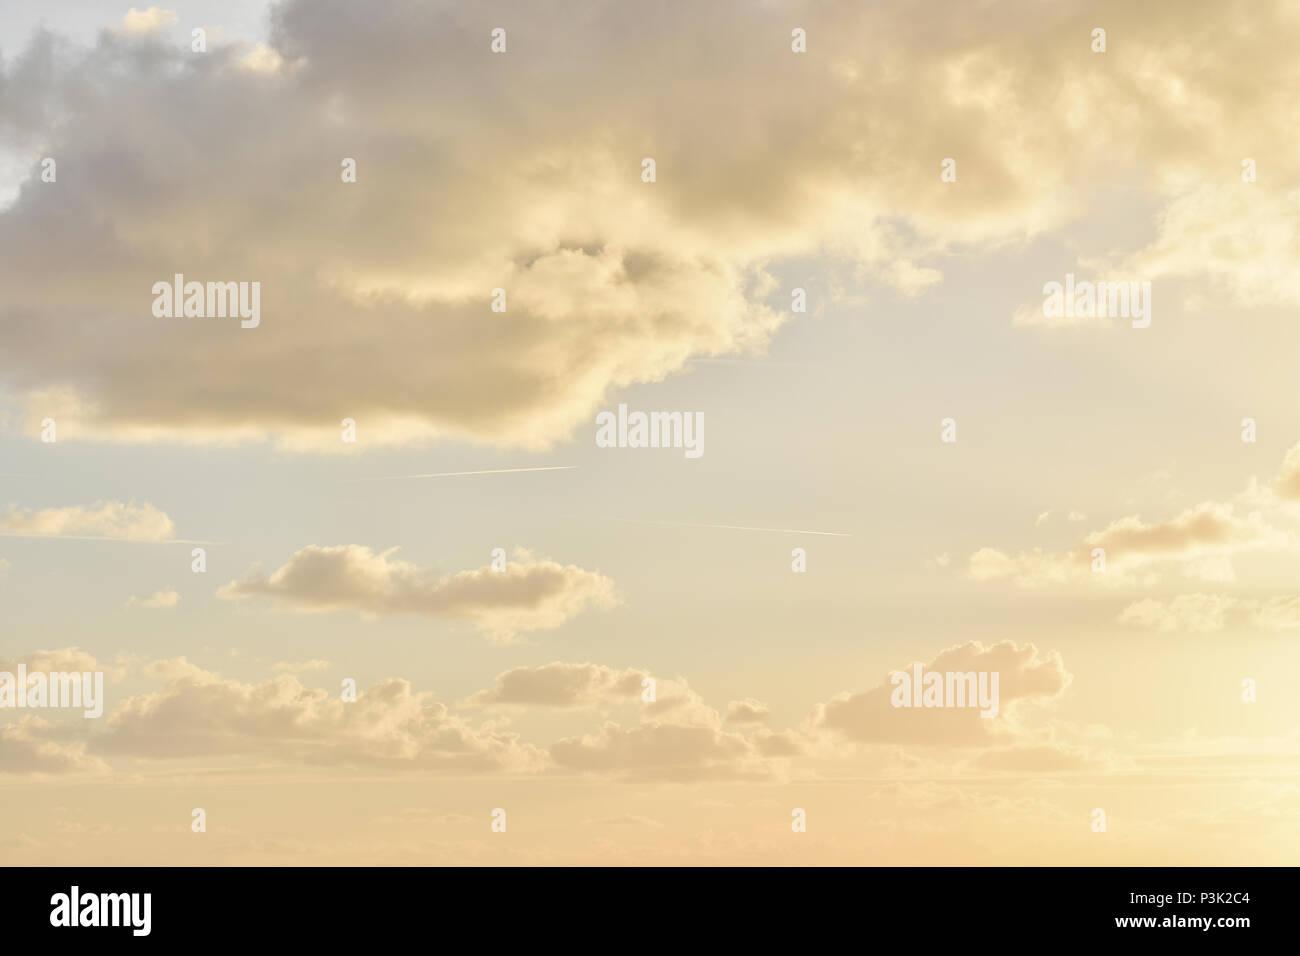 Sunset, Cilento, Italy - Stock Image